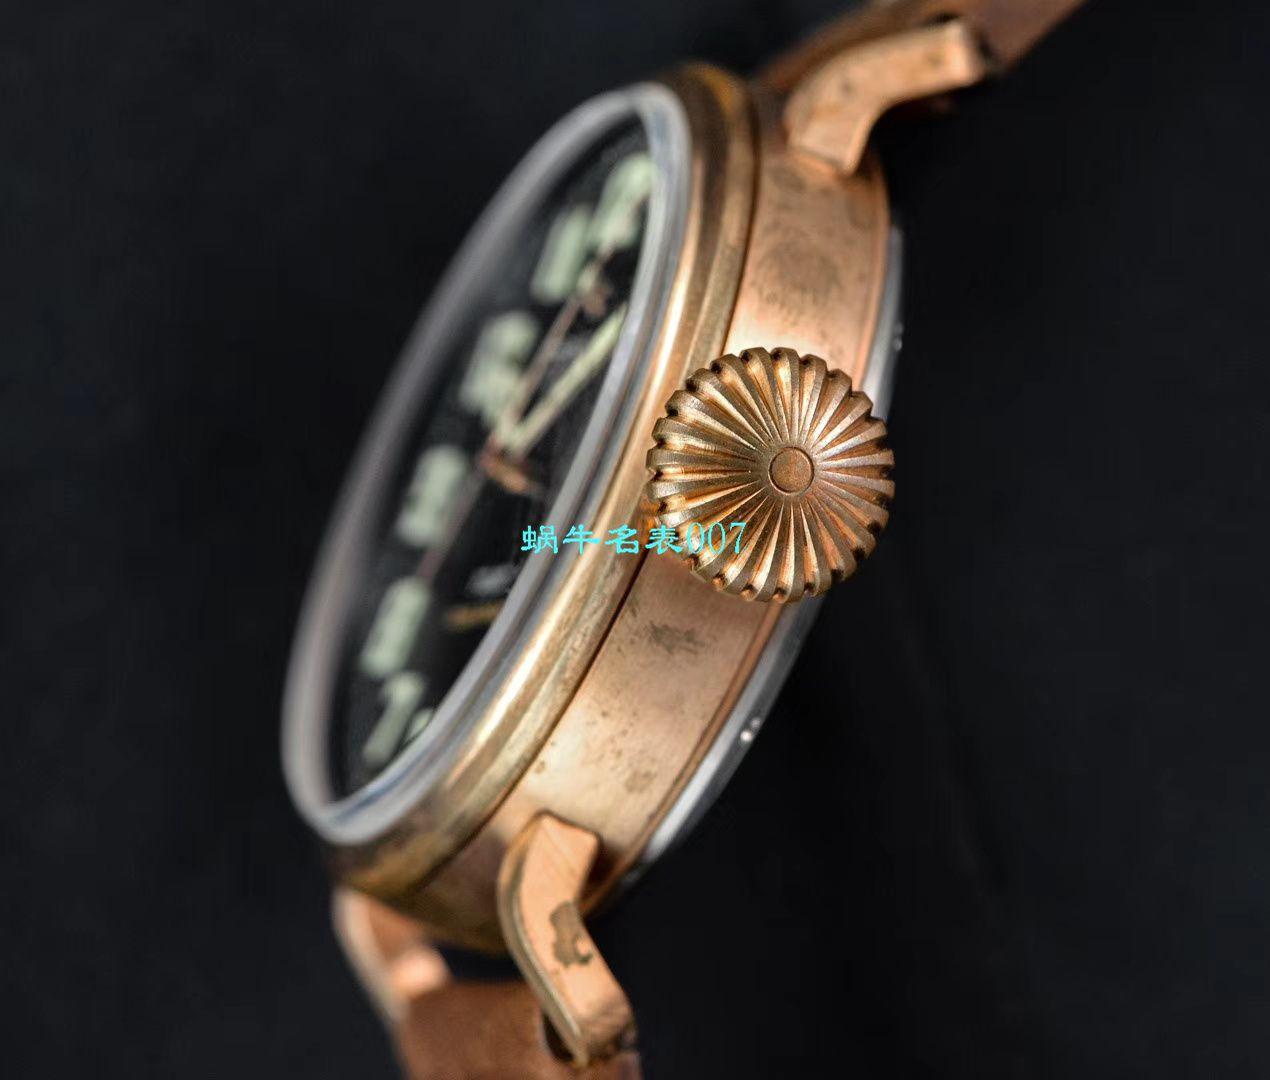 【XF厂Zenith青铜大飞复刻手表】真力时飞行员系列29.2430.679/21.C753腕表 / ZLS039